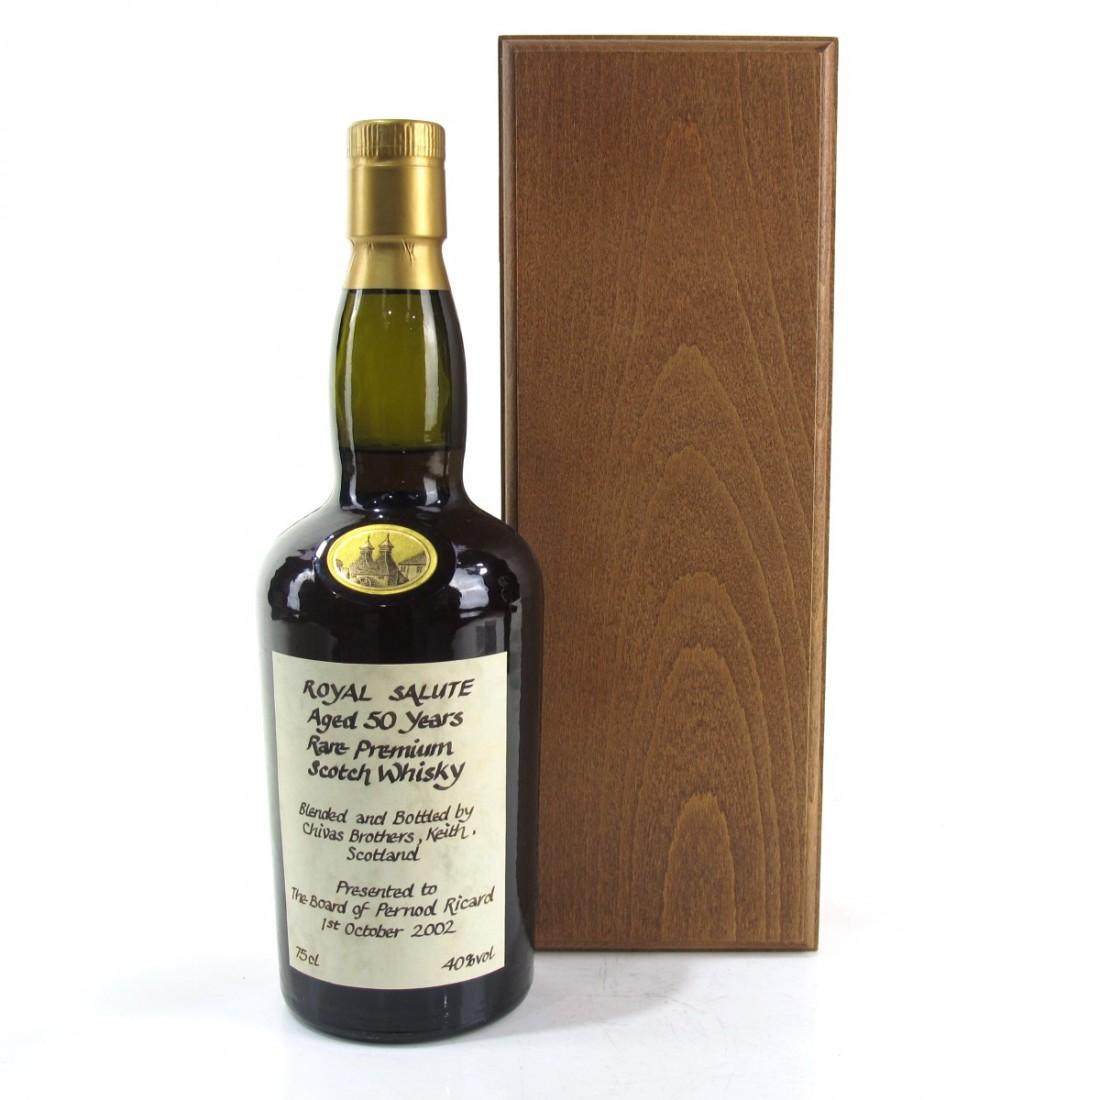 Chivas Royal Salute 50 Year Old / Pernod Ricard Board Presentation